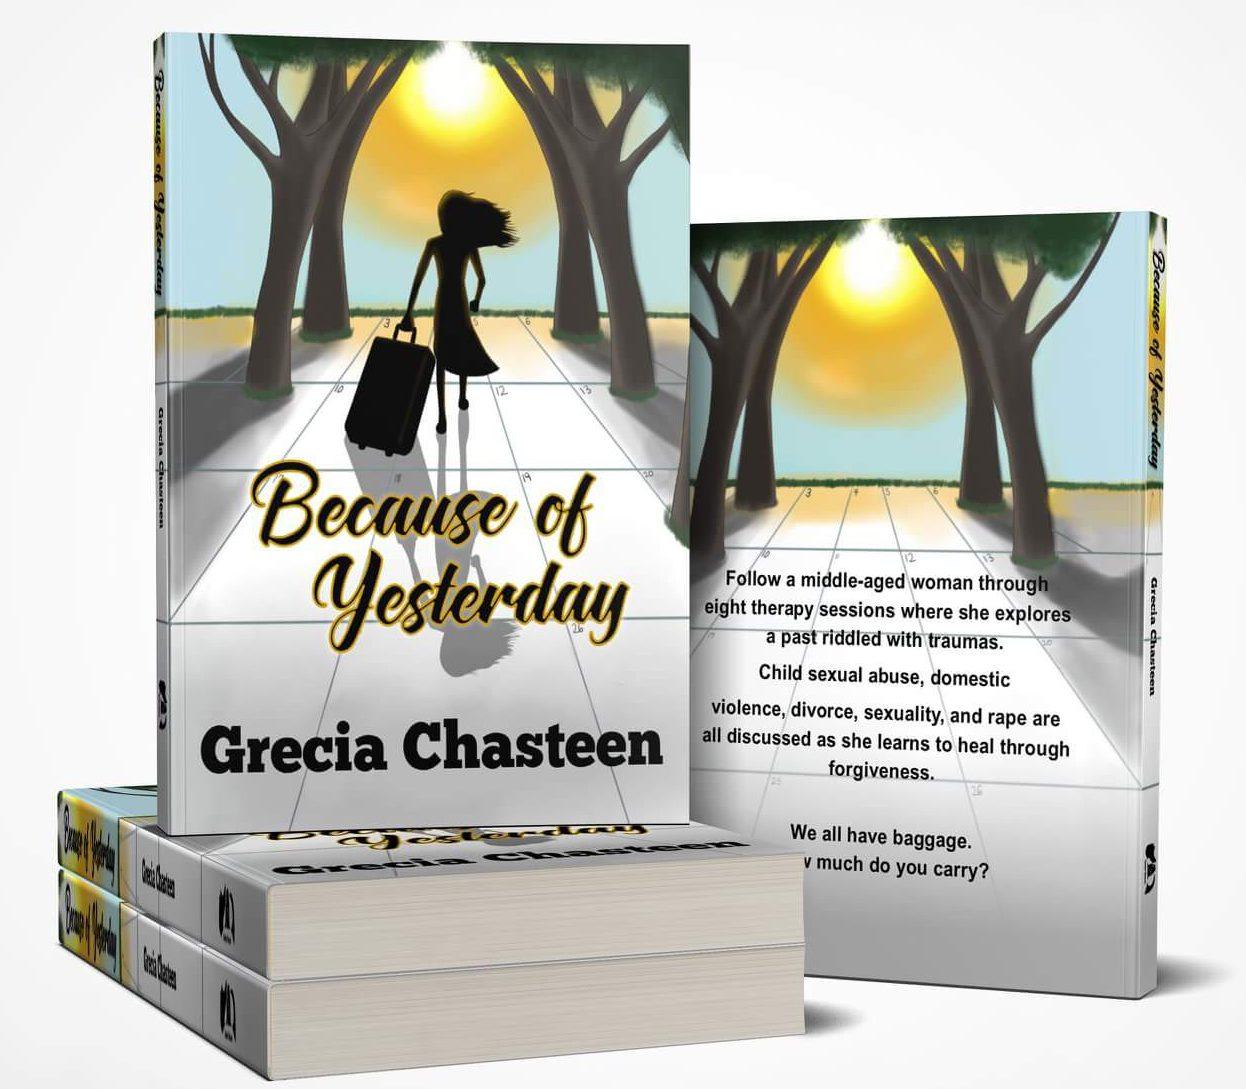 Grecia Chasteen